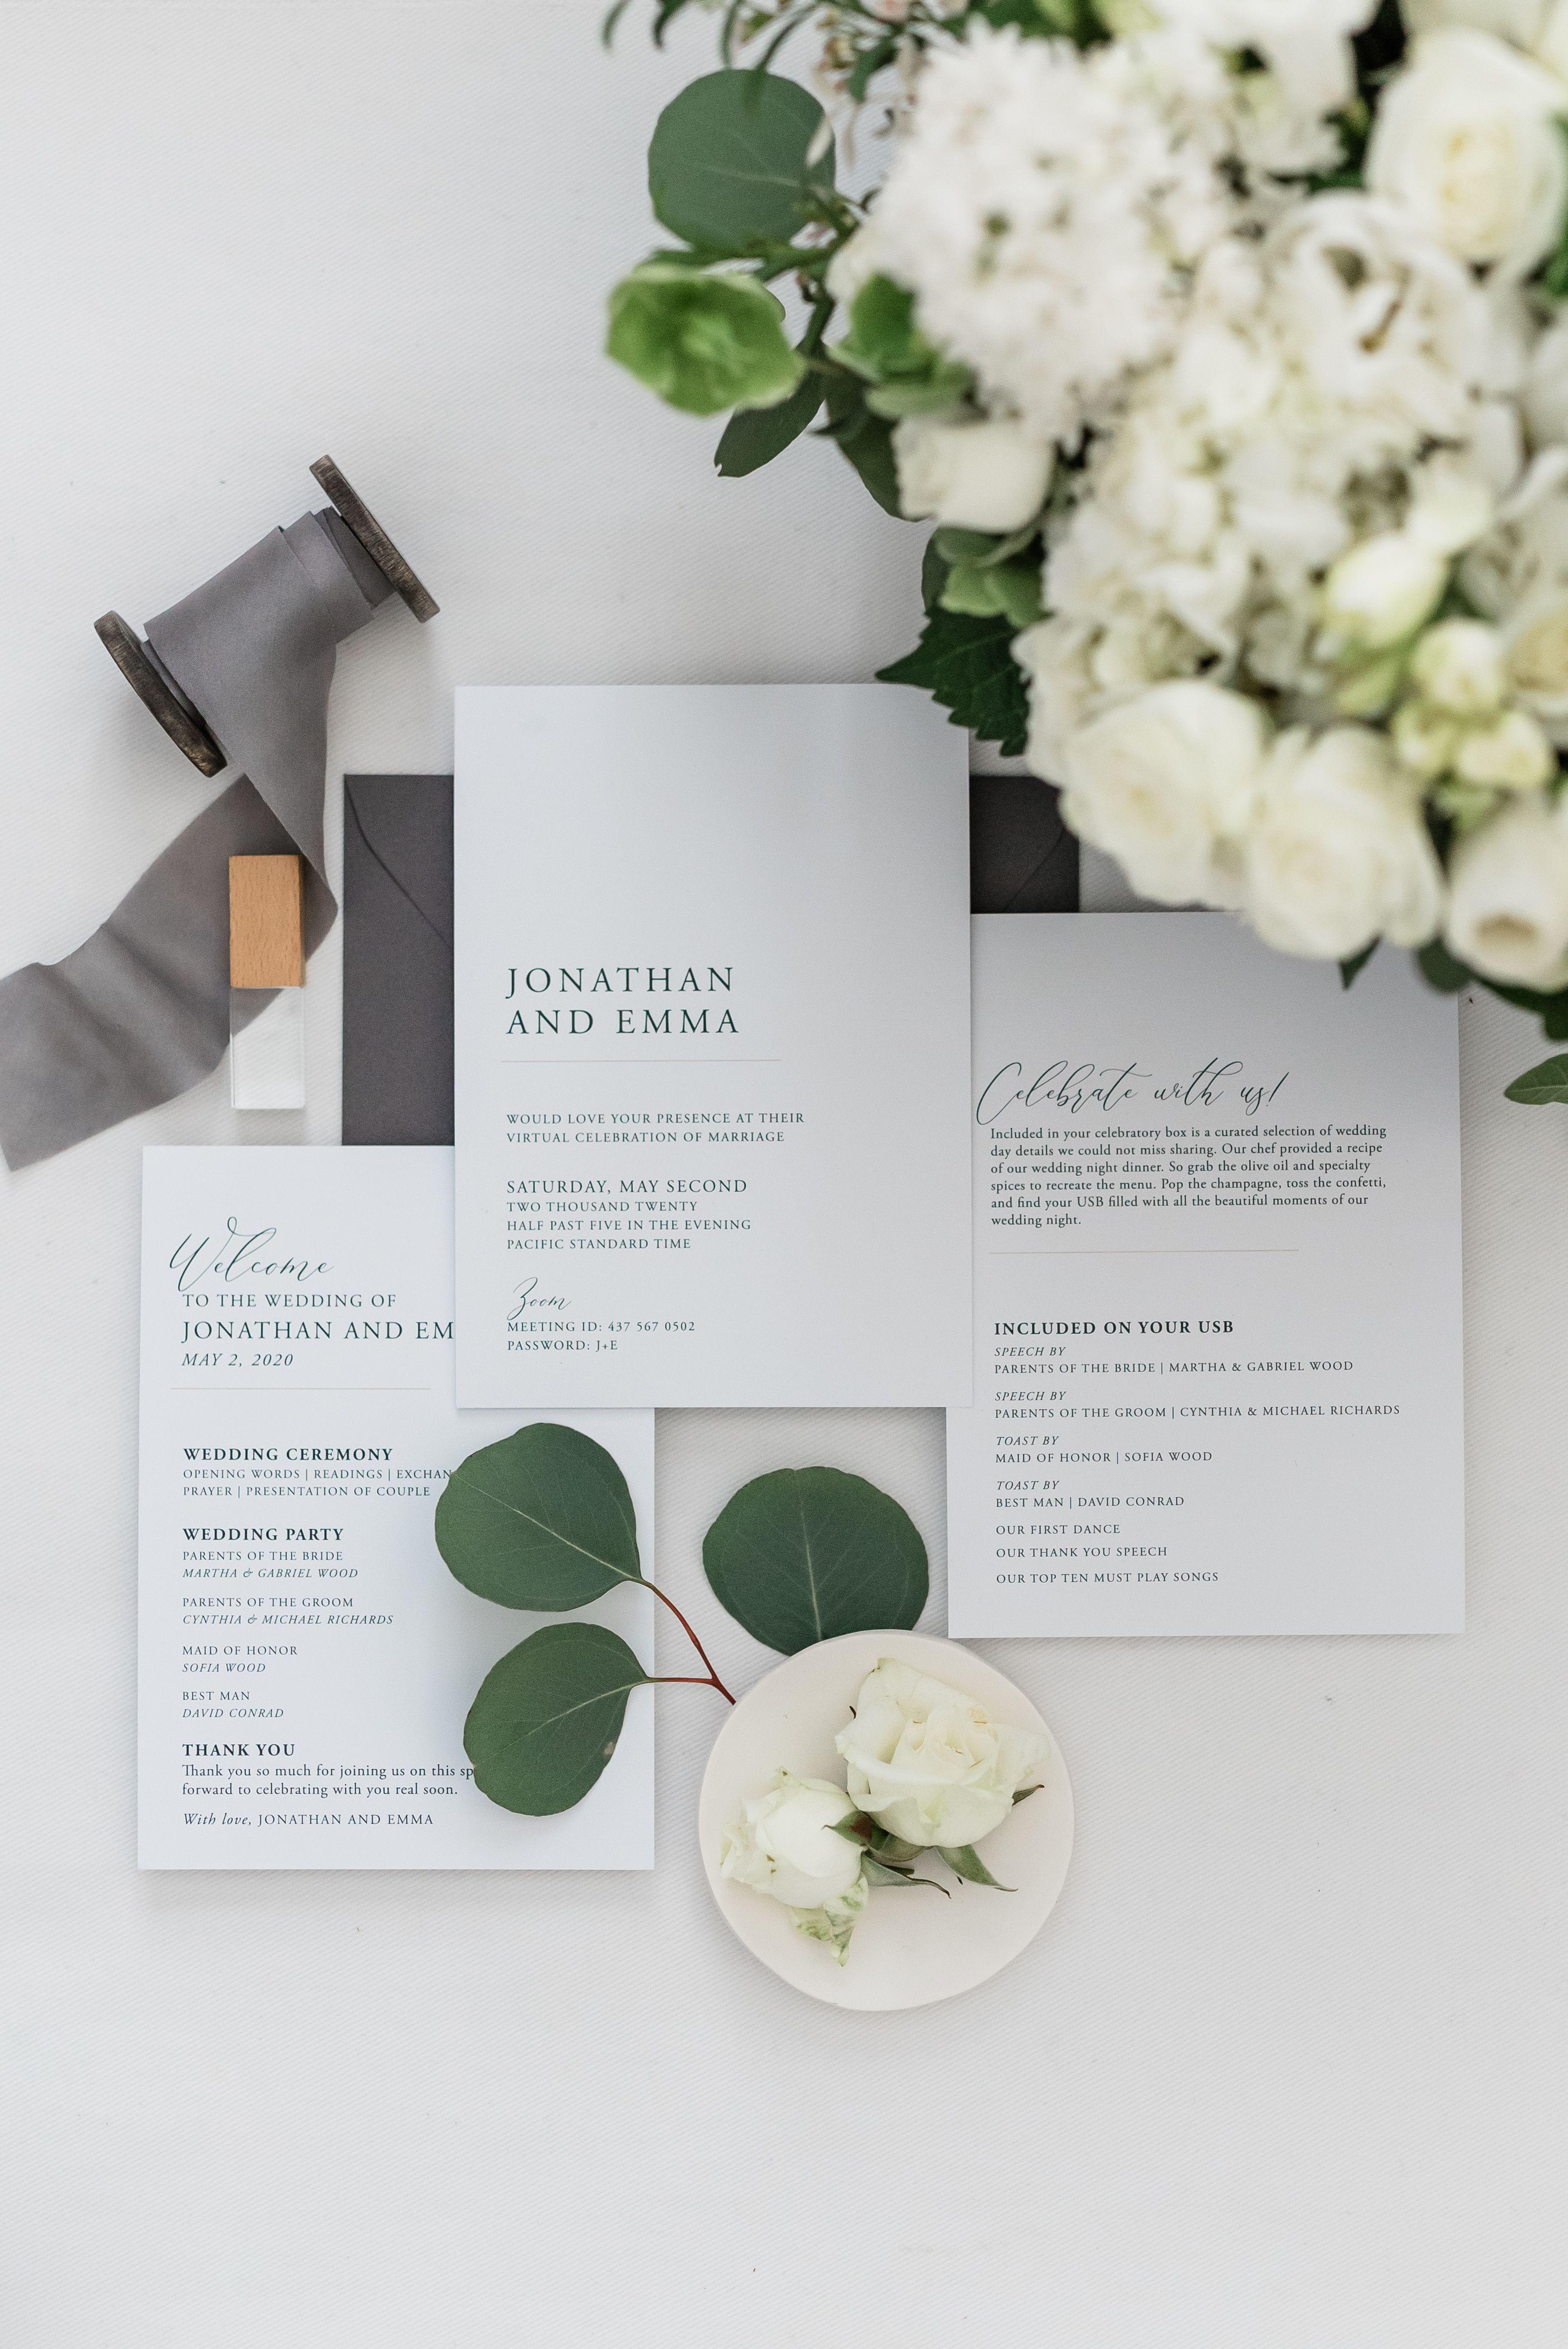 Pin on Celebration Box for Virtual Wedding